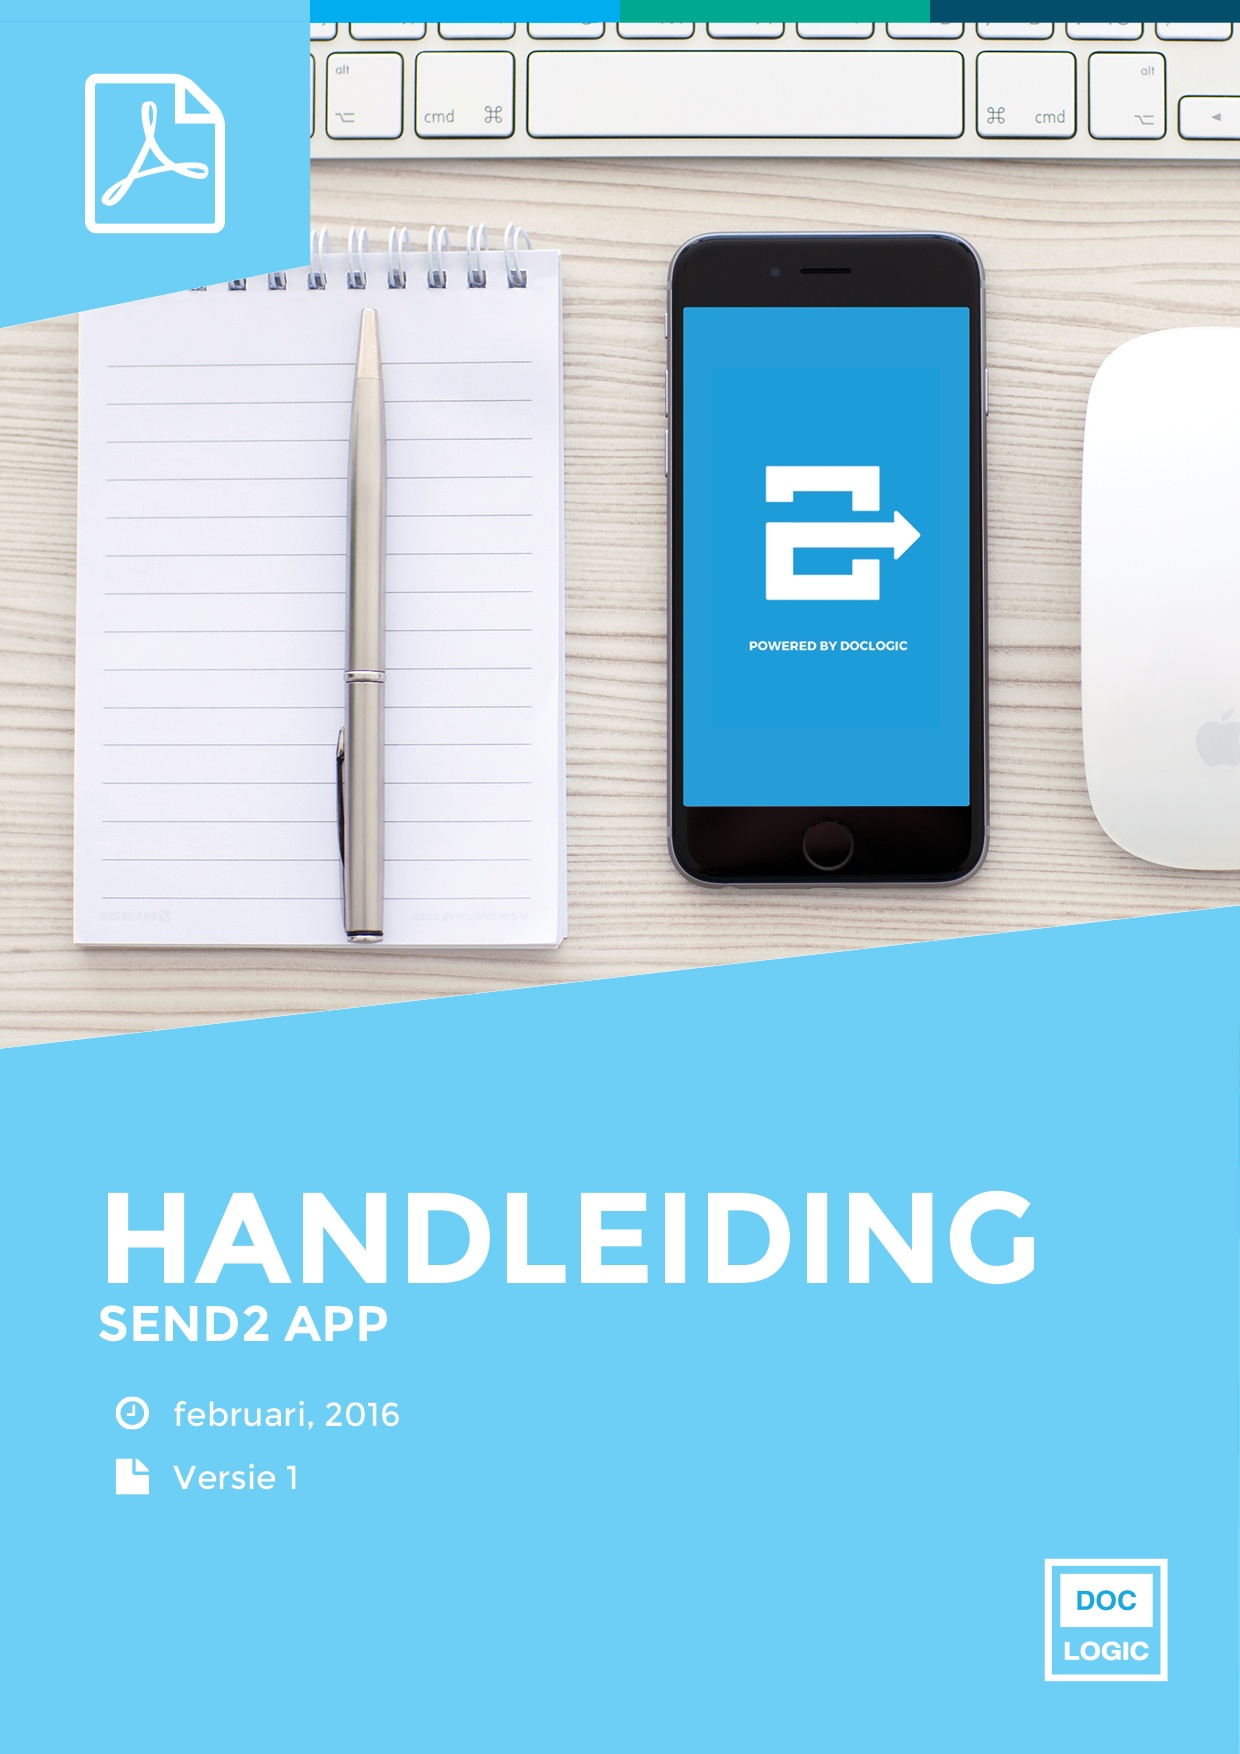 SEND2 app